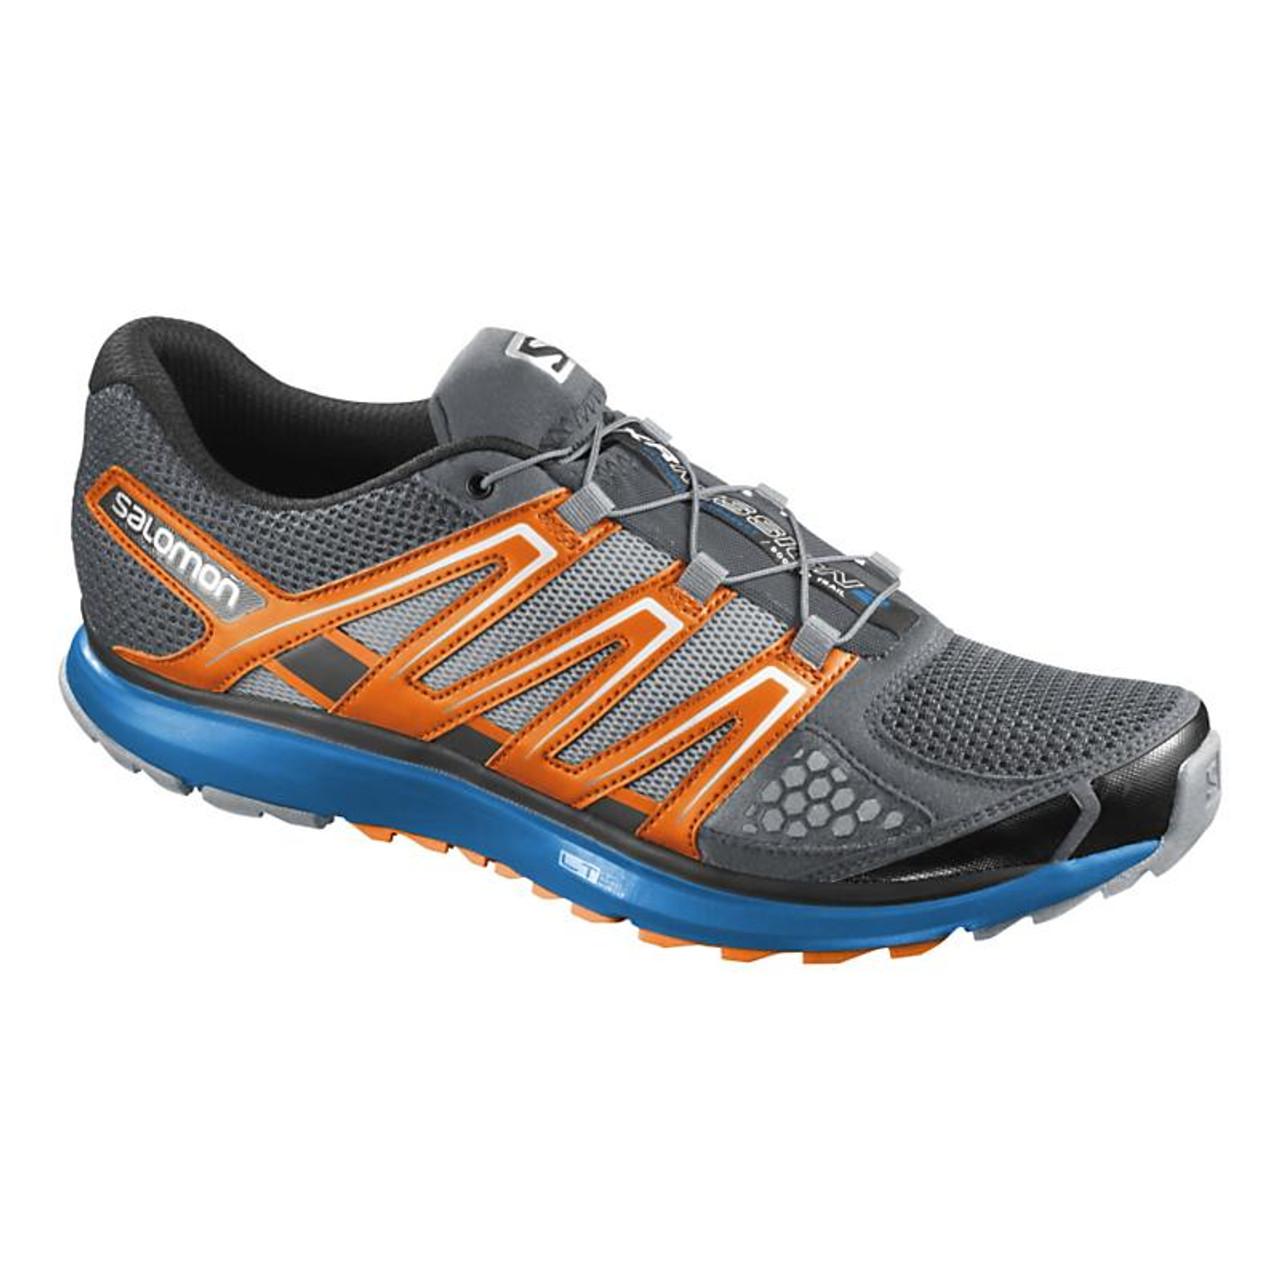 Men's Salomon X Scream Trail Running Shoe | Free Shipping